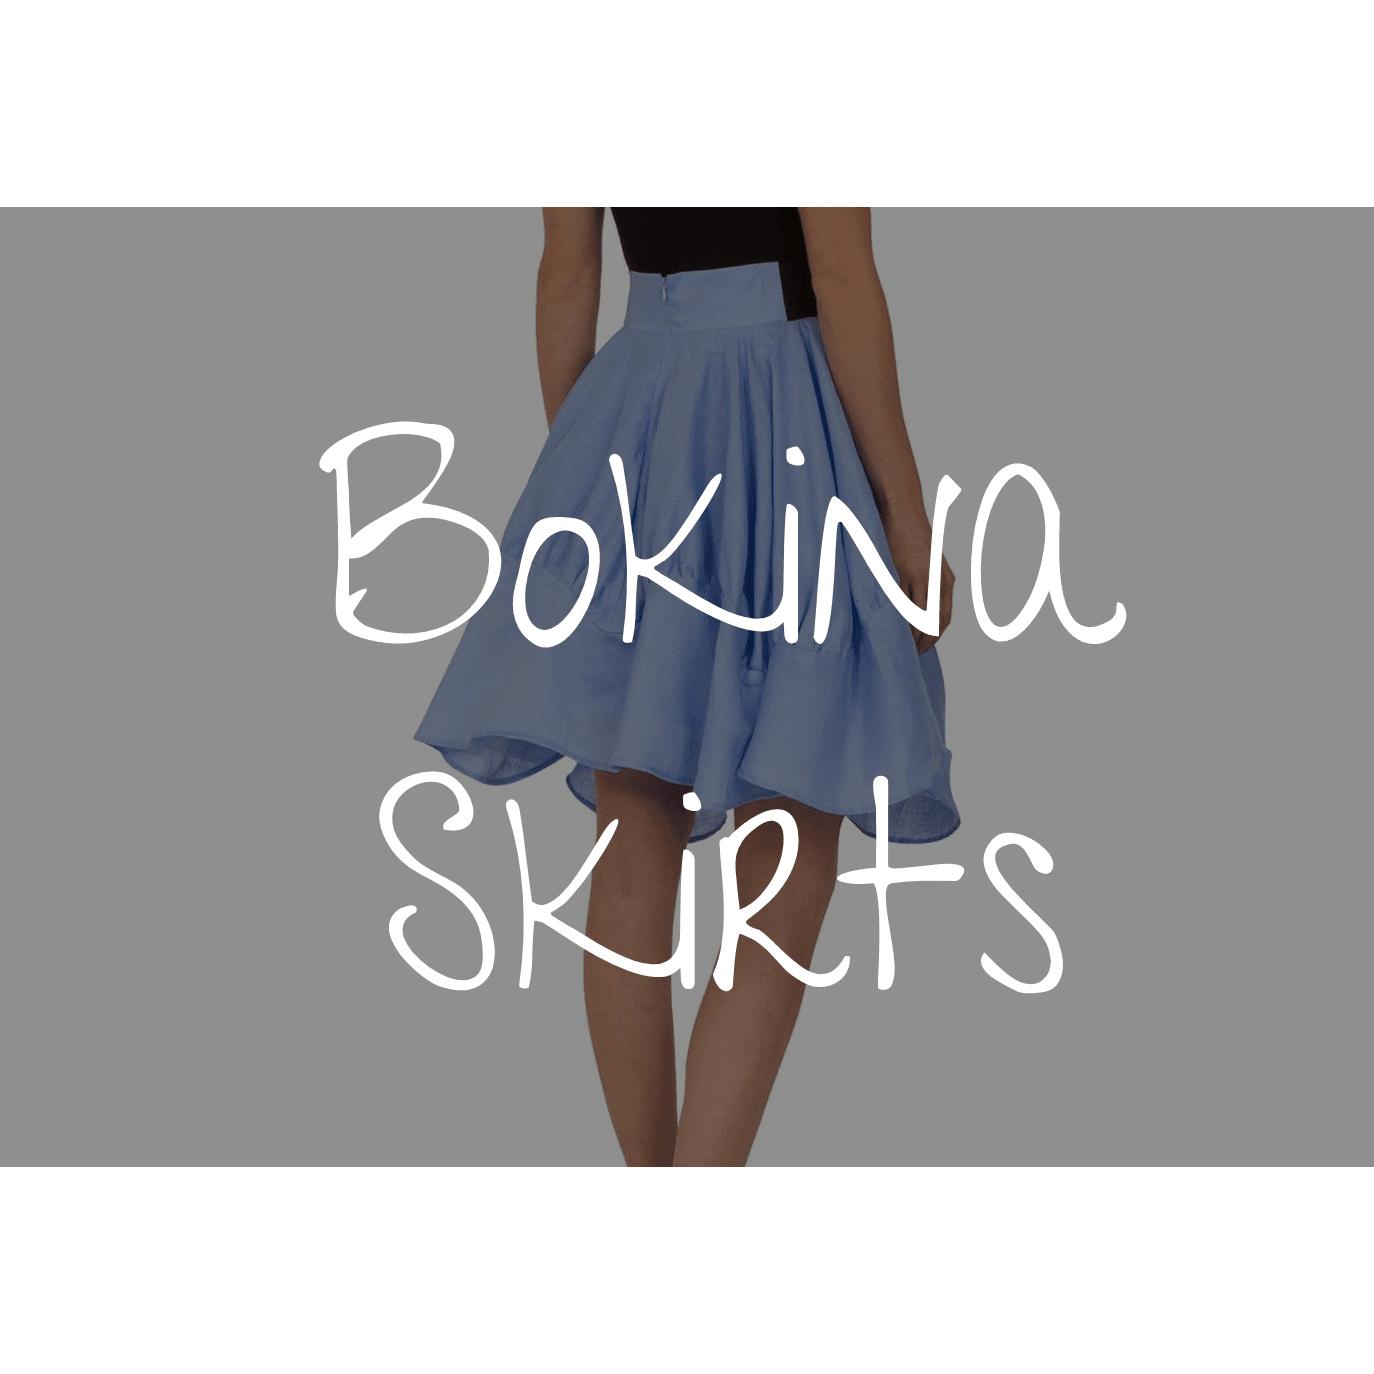 Bokina Skirts - Southall, London UB2 5DF - 07983 529669 | ShowMeLocal.com